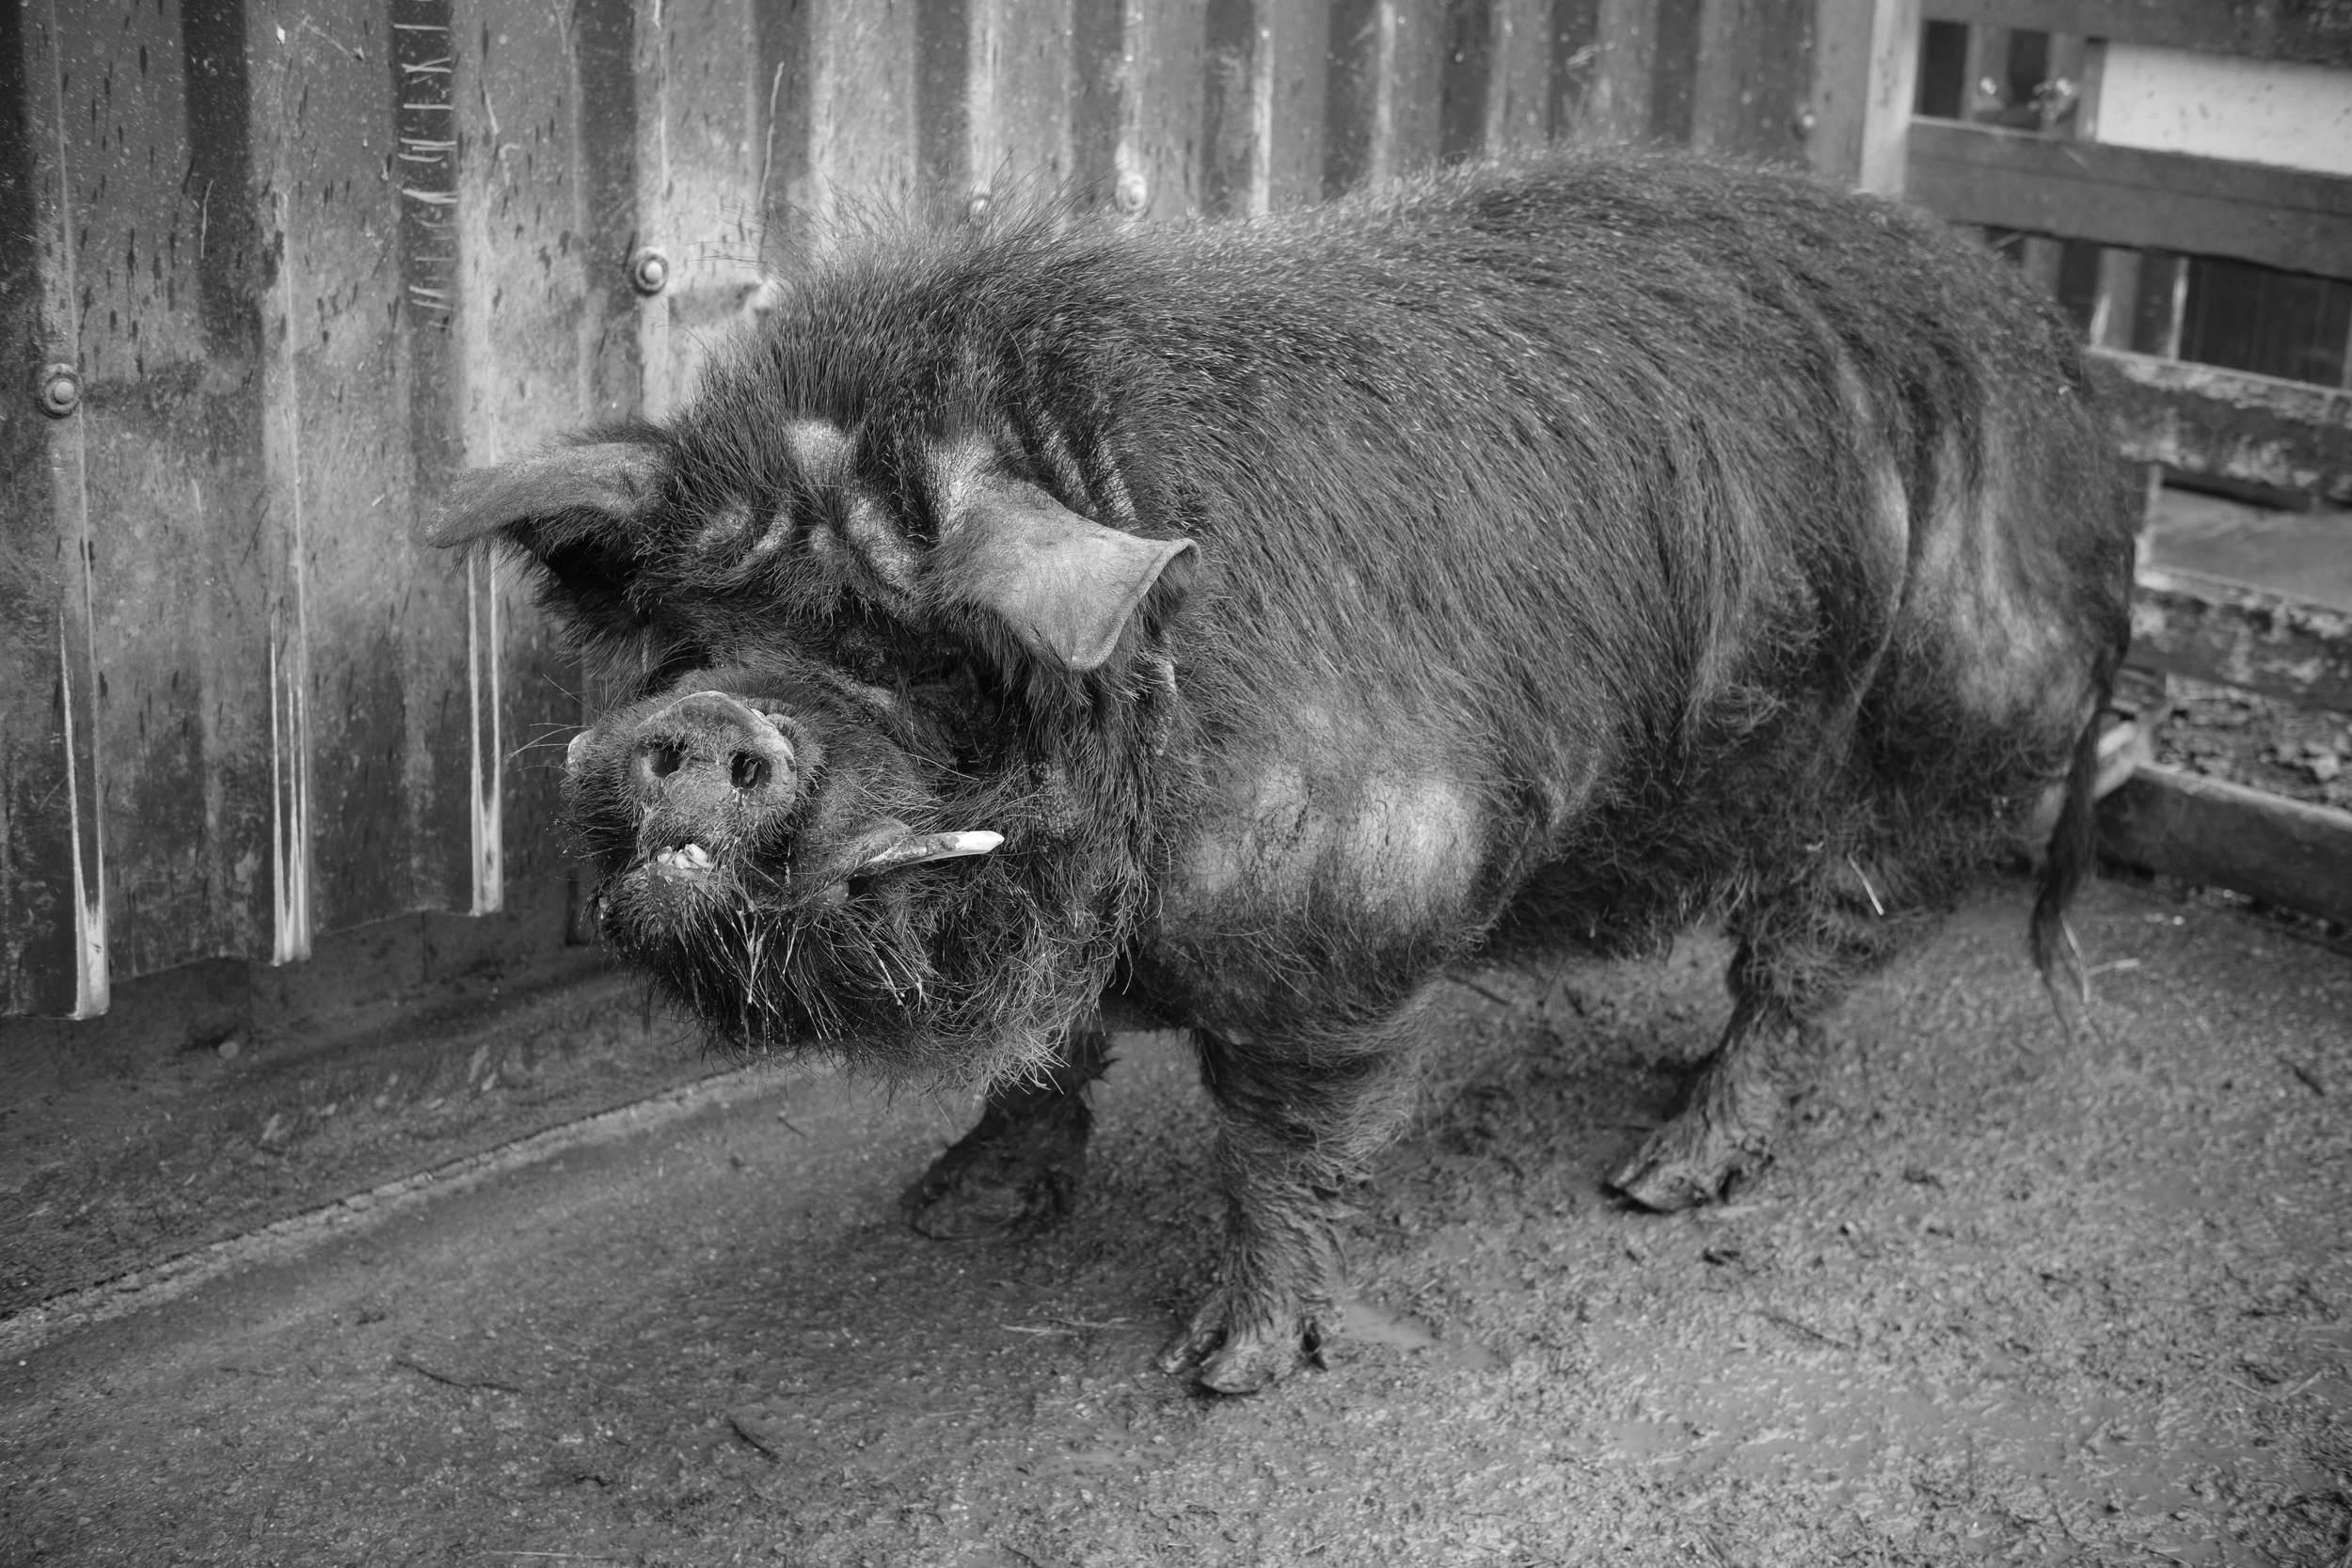 Black and White male pig at Eshottheugh Animal Park, Northumberland